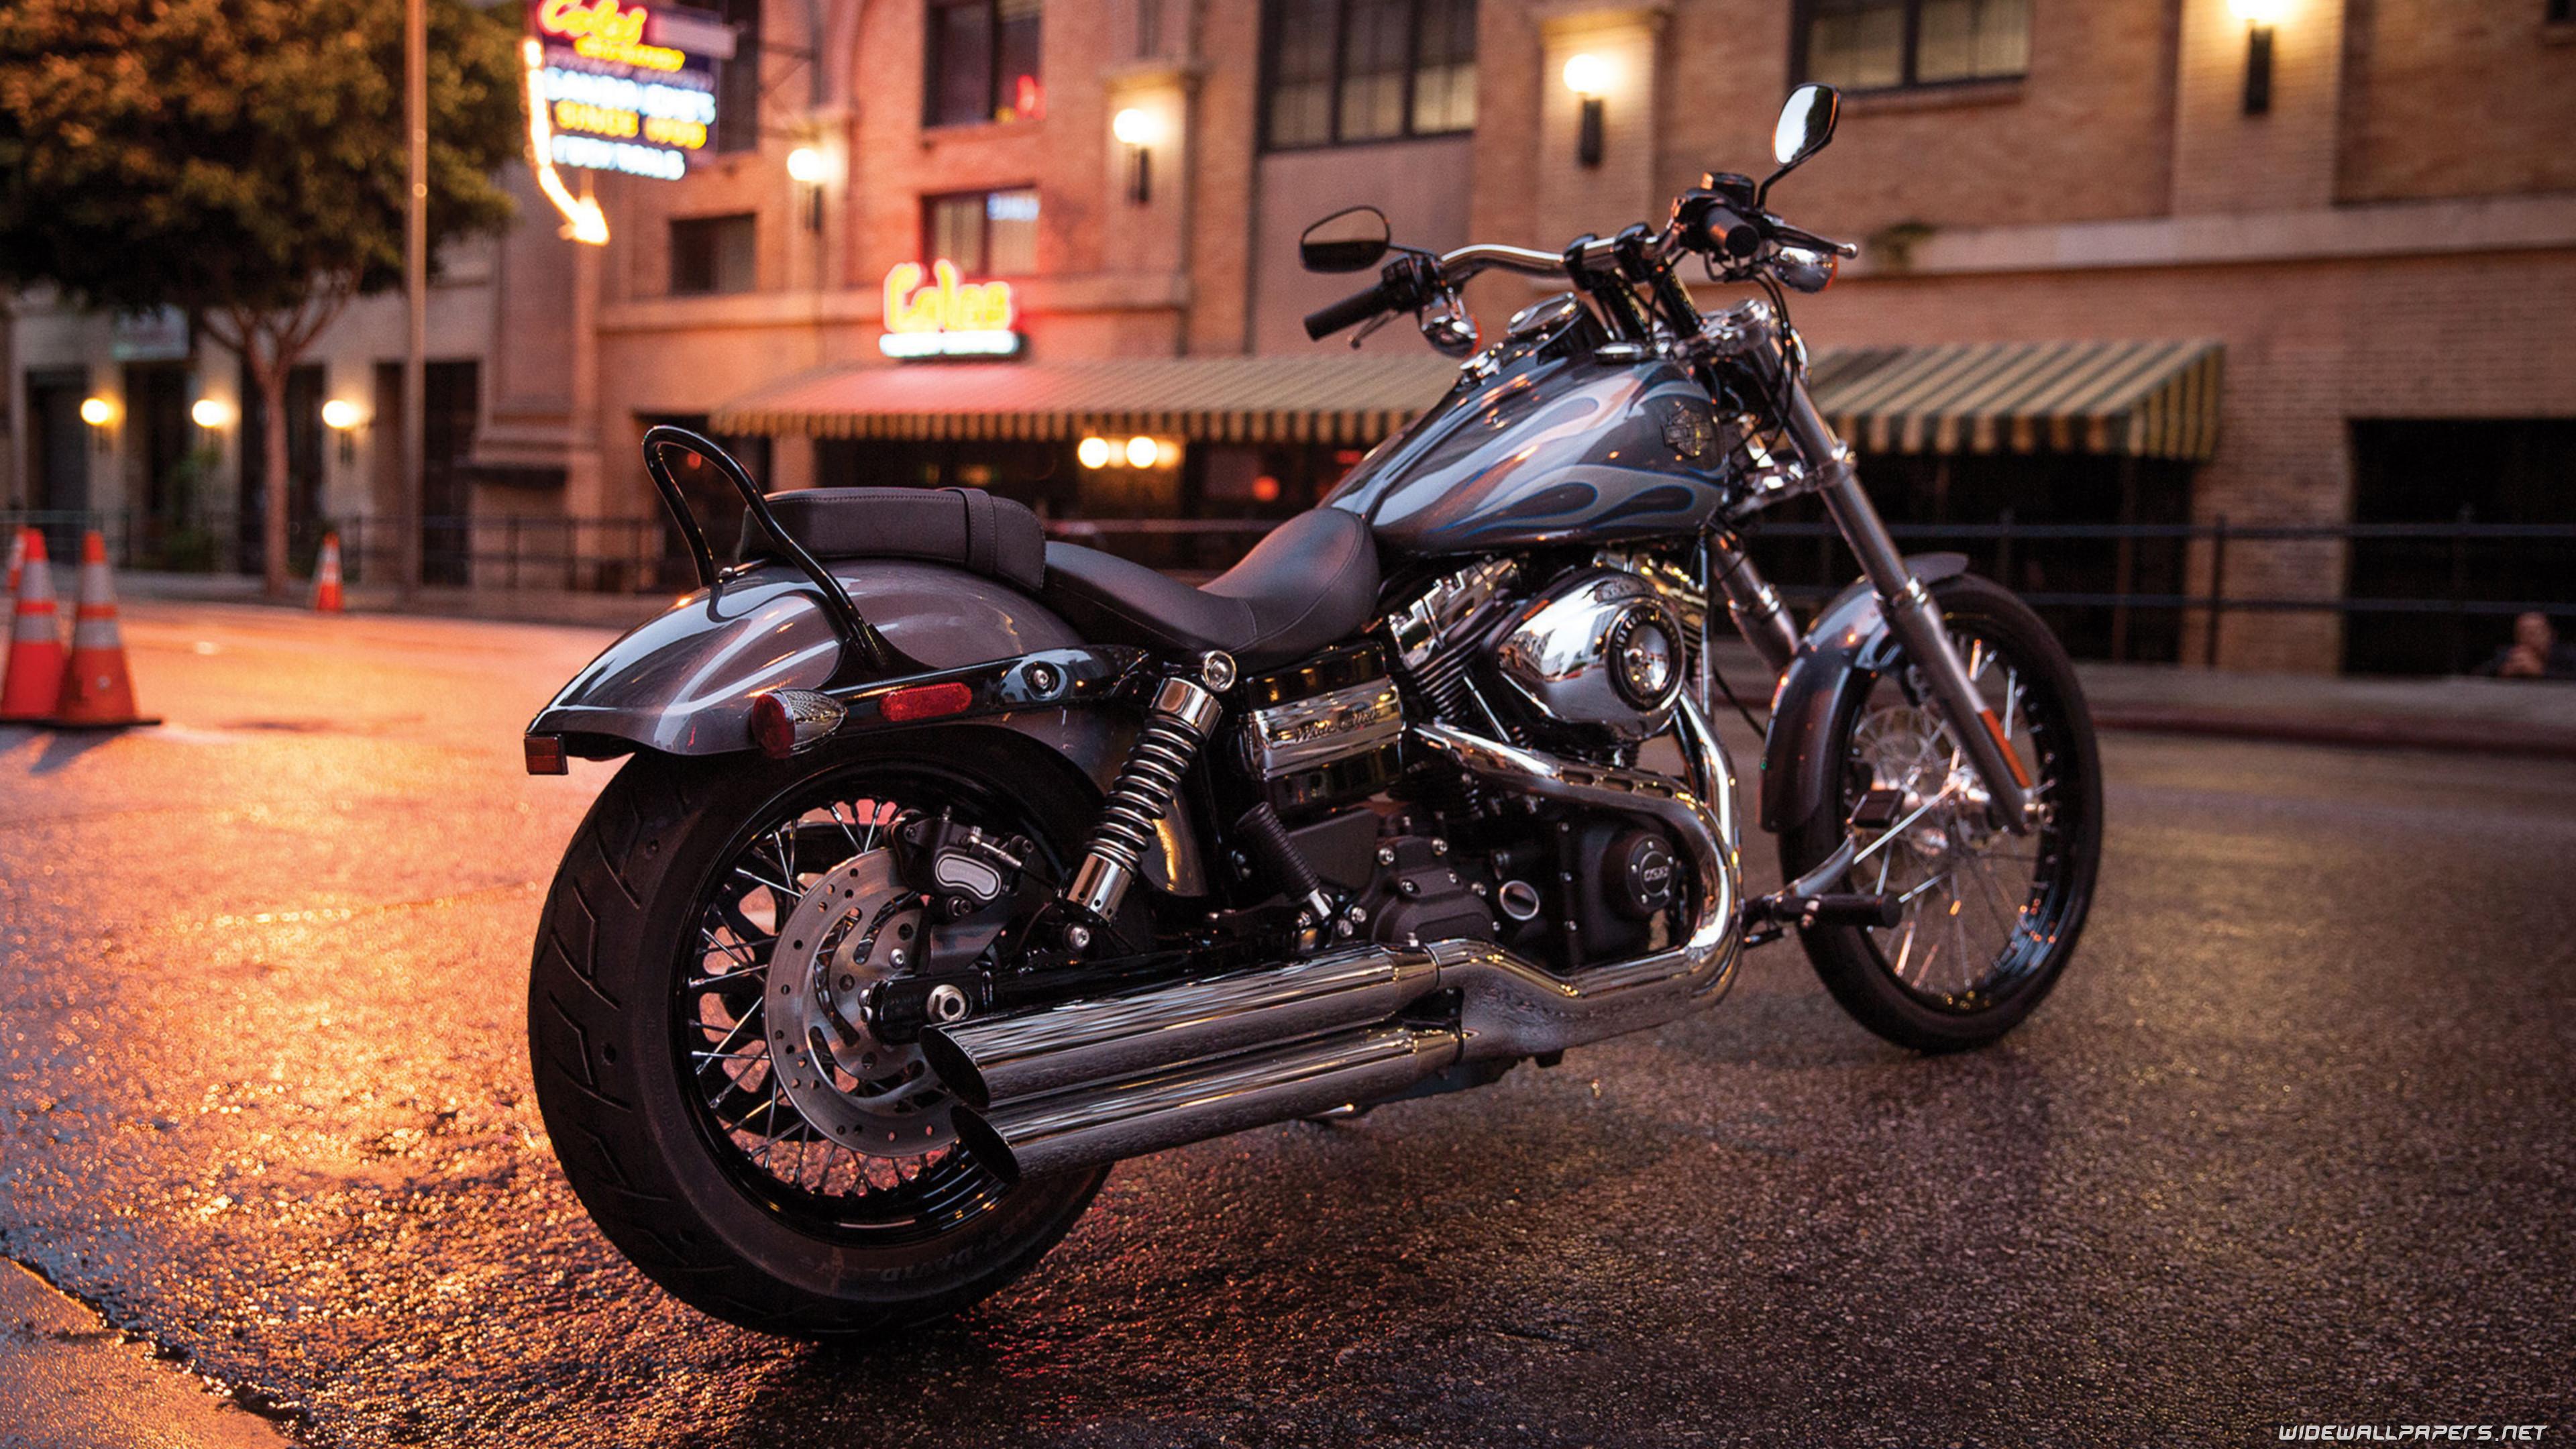 Harley Davidson Background Pictures (69+ Images